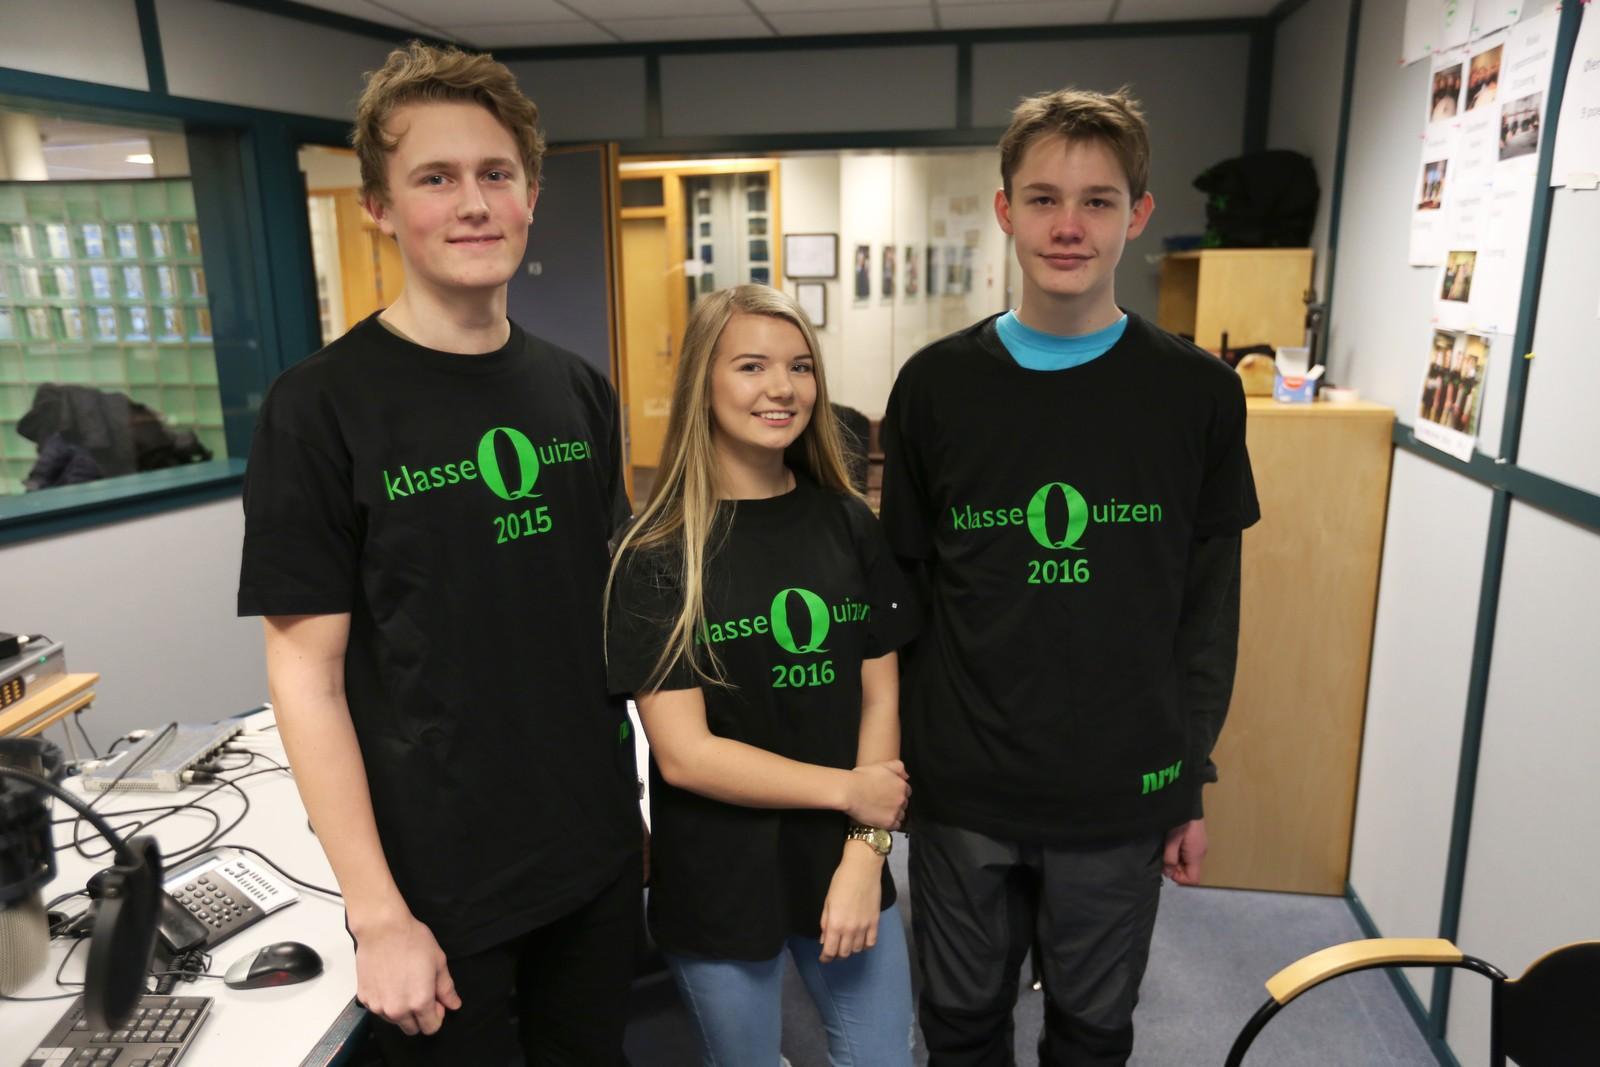 8 POENG: Orstad skole: Bjarte Matre, Ingrid Njærheim, Tobias Refsland.